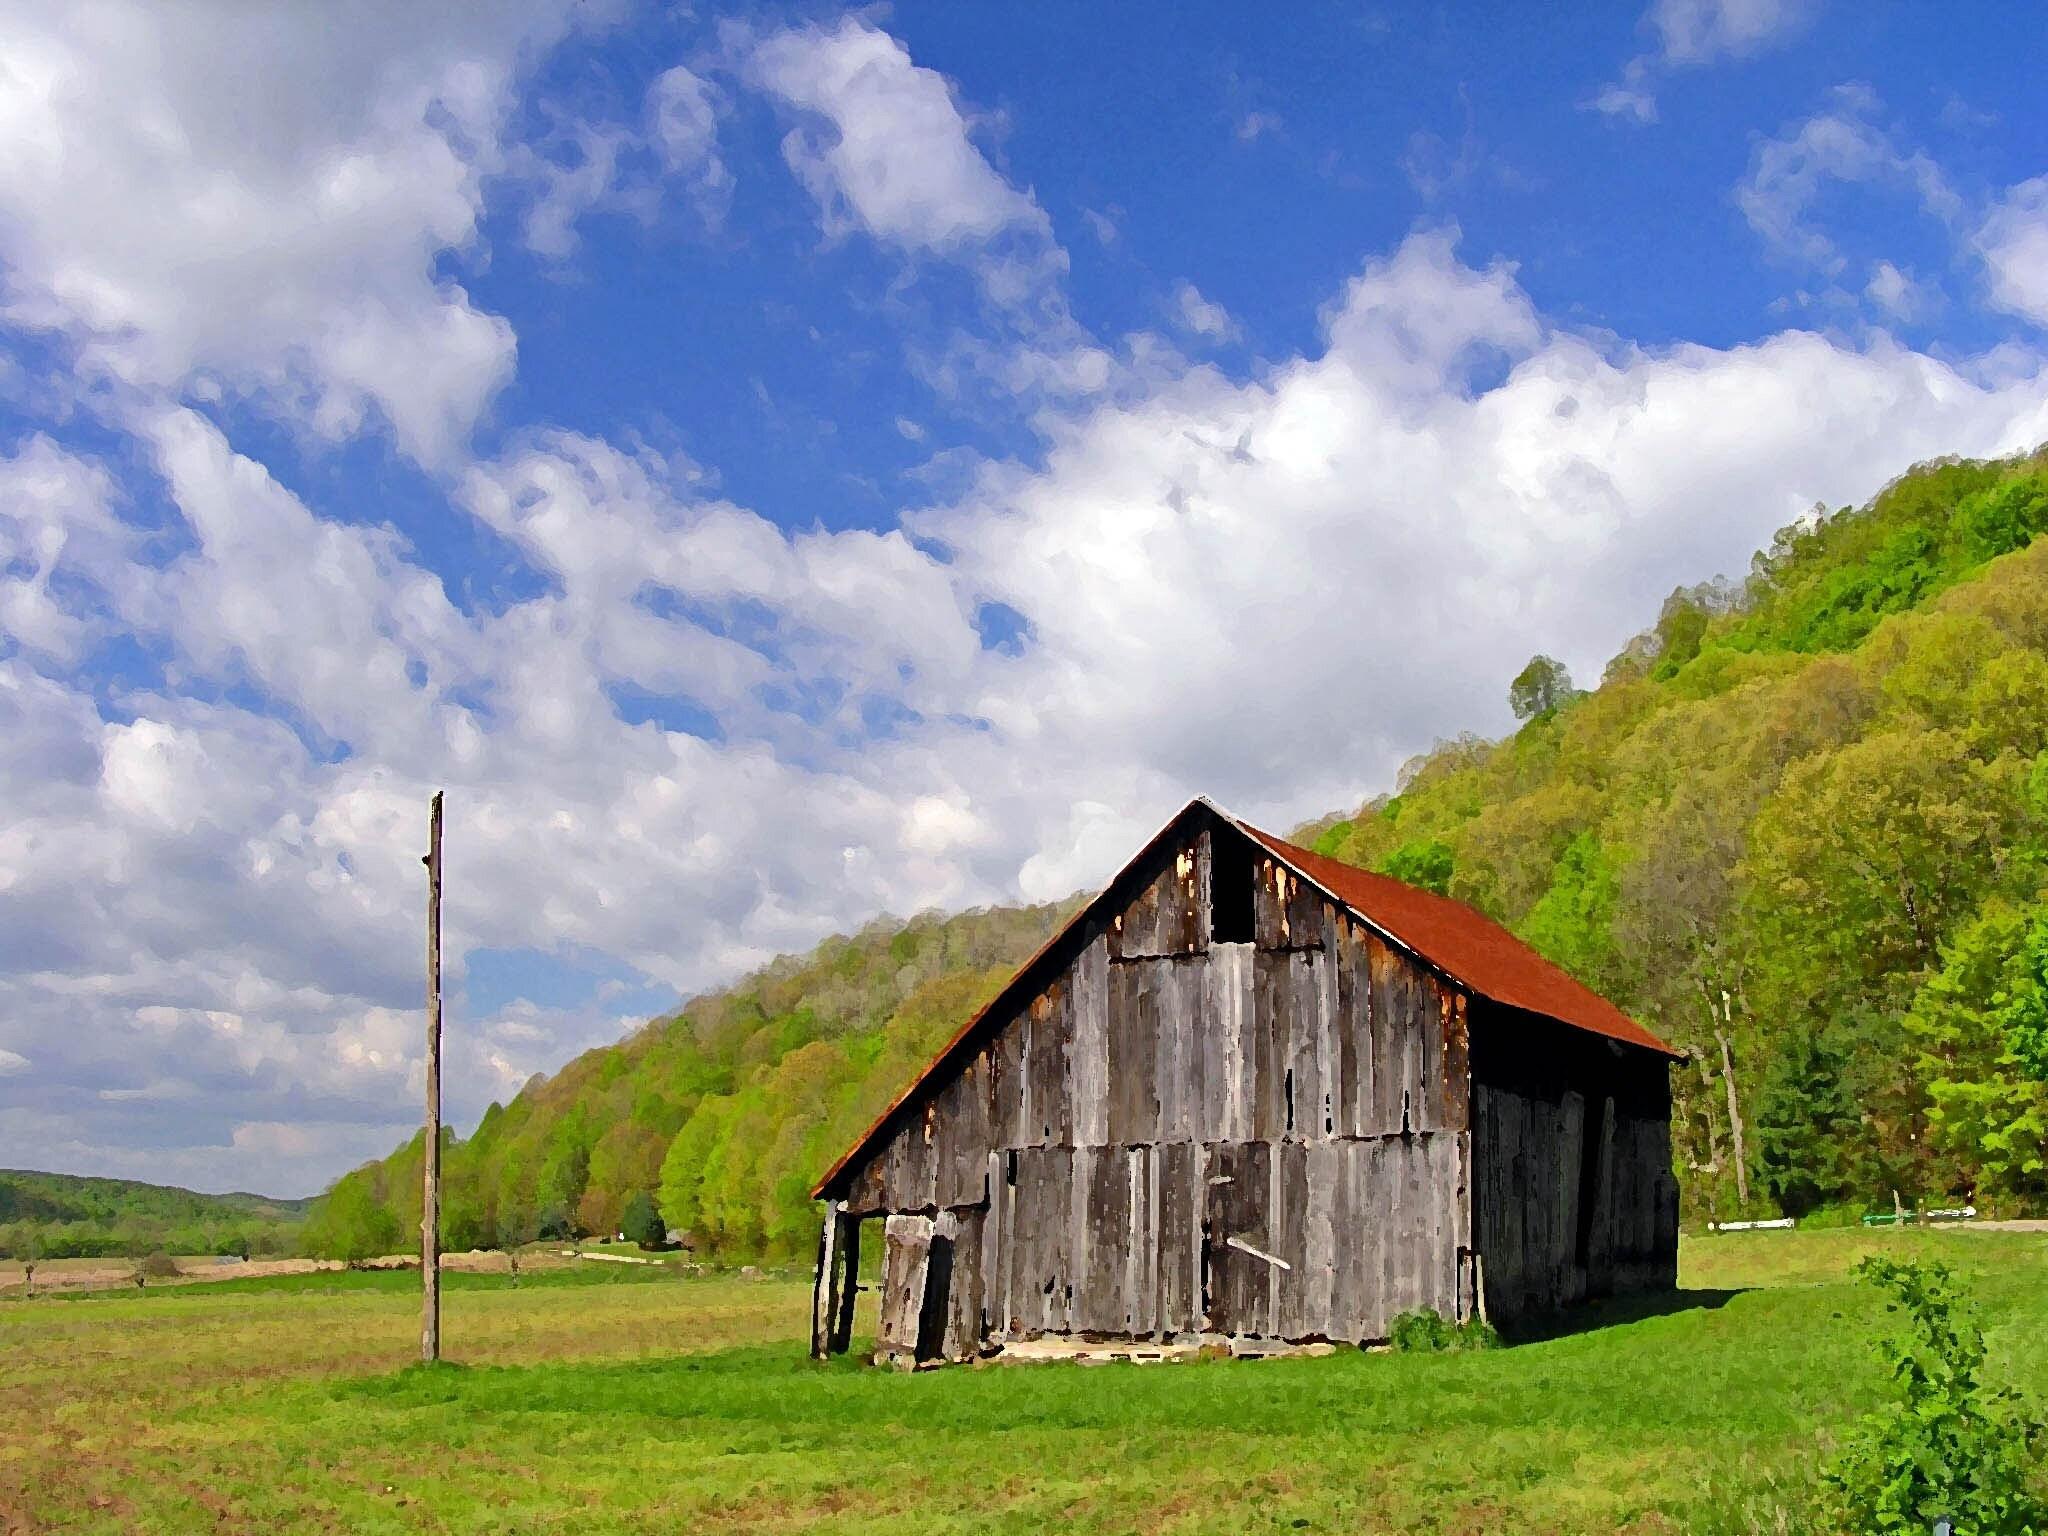 Barn Landscape Photography Images